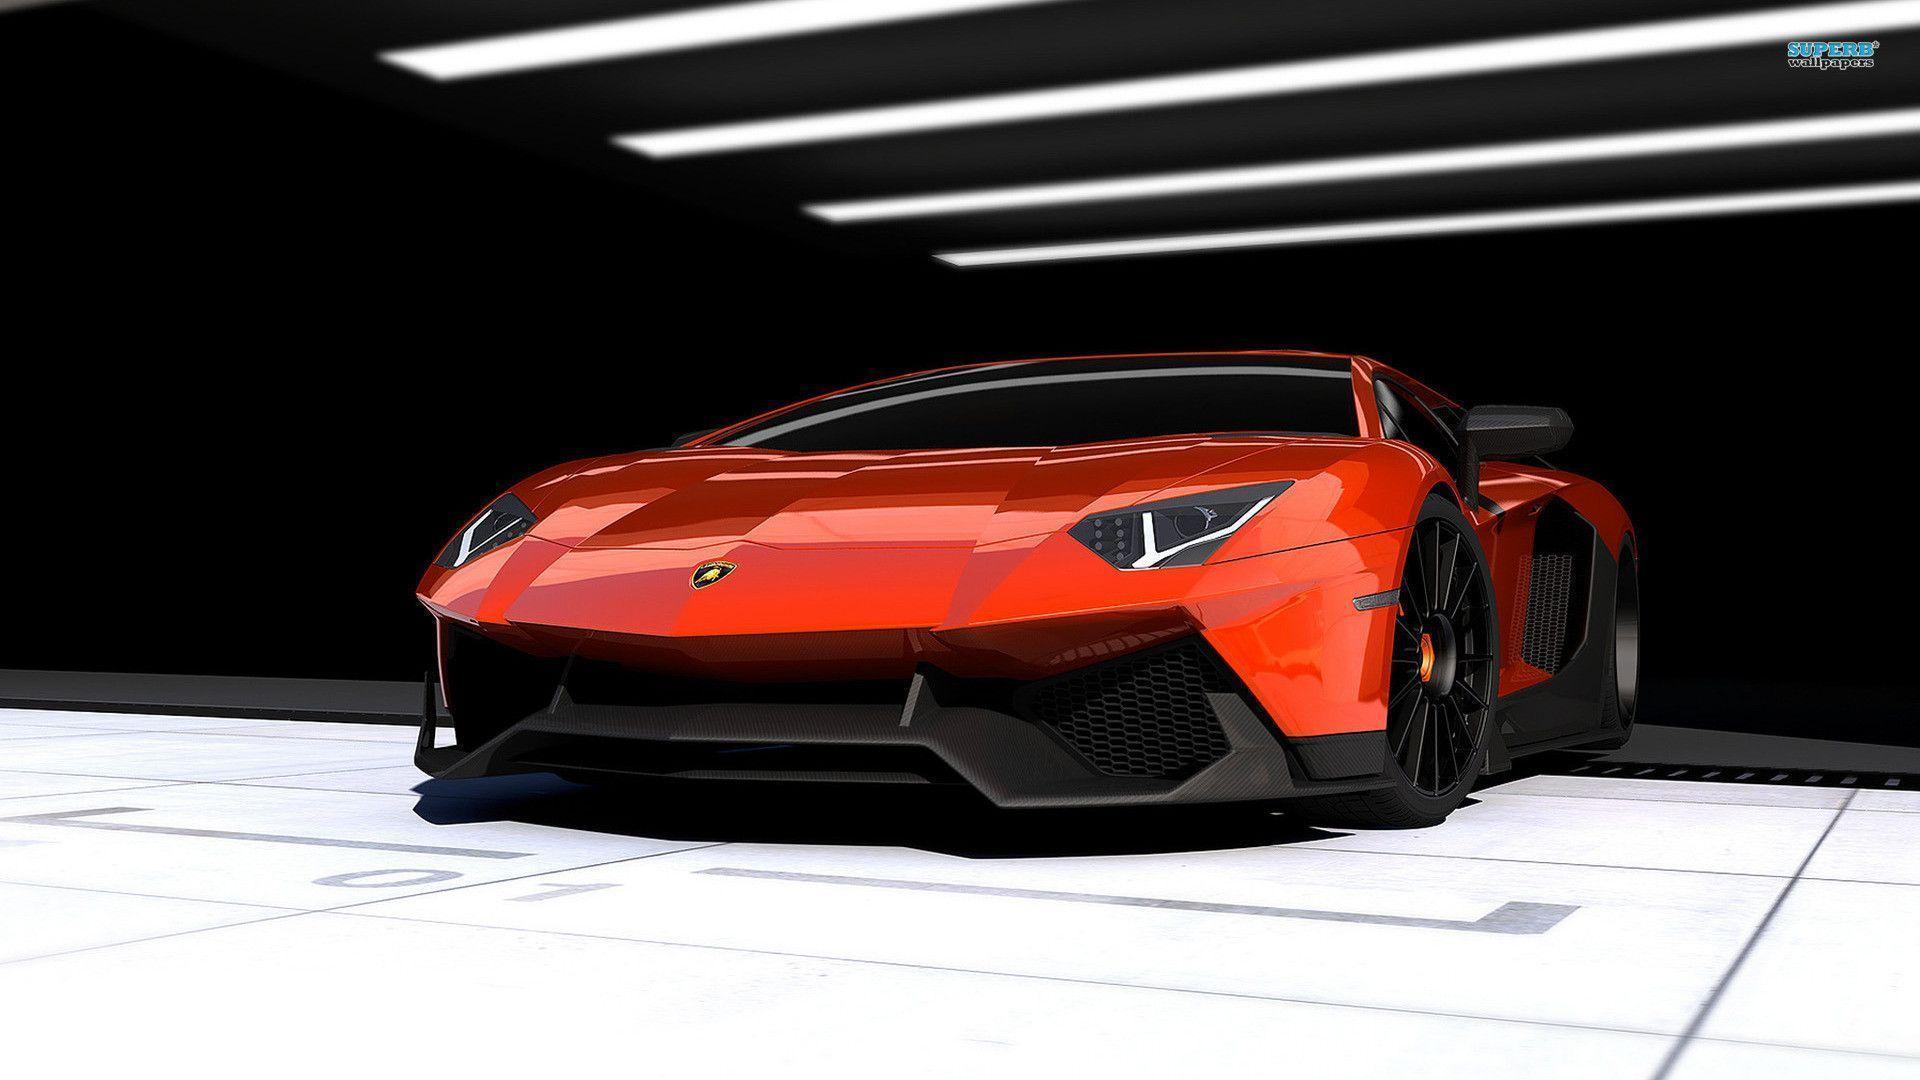 Fondos De Pantalla De Autos Deportivos Para Celular Fondos: Red Lamborghini Reventon Wallpapers